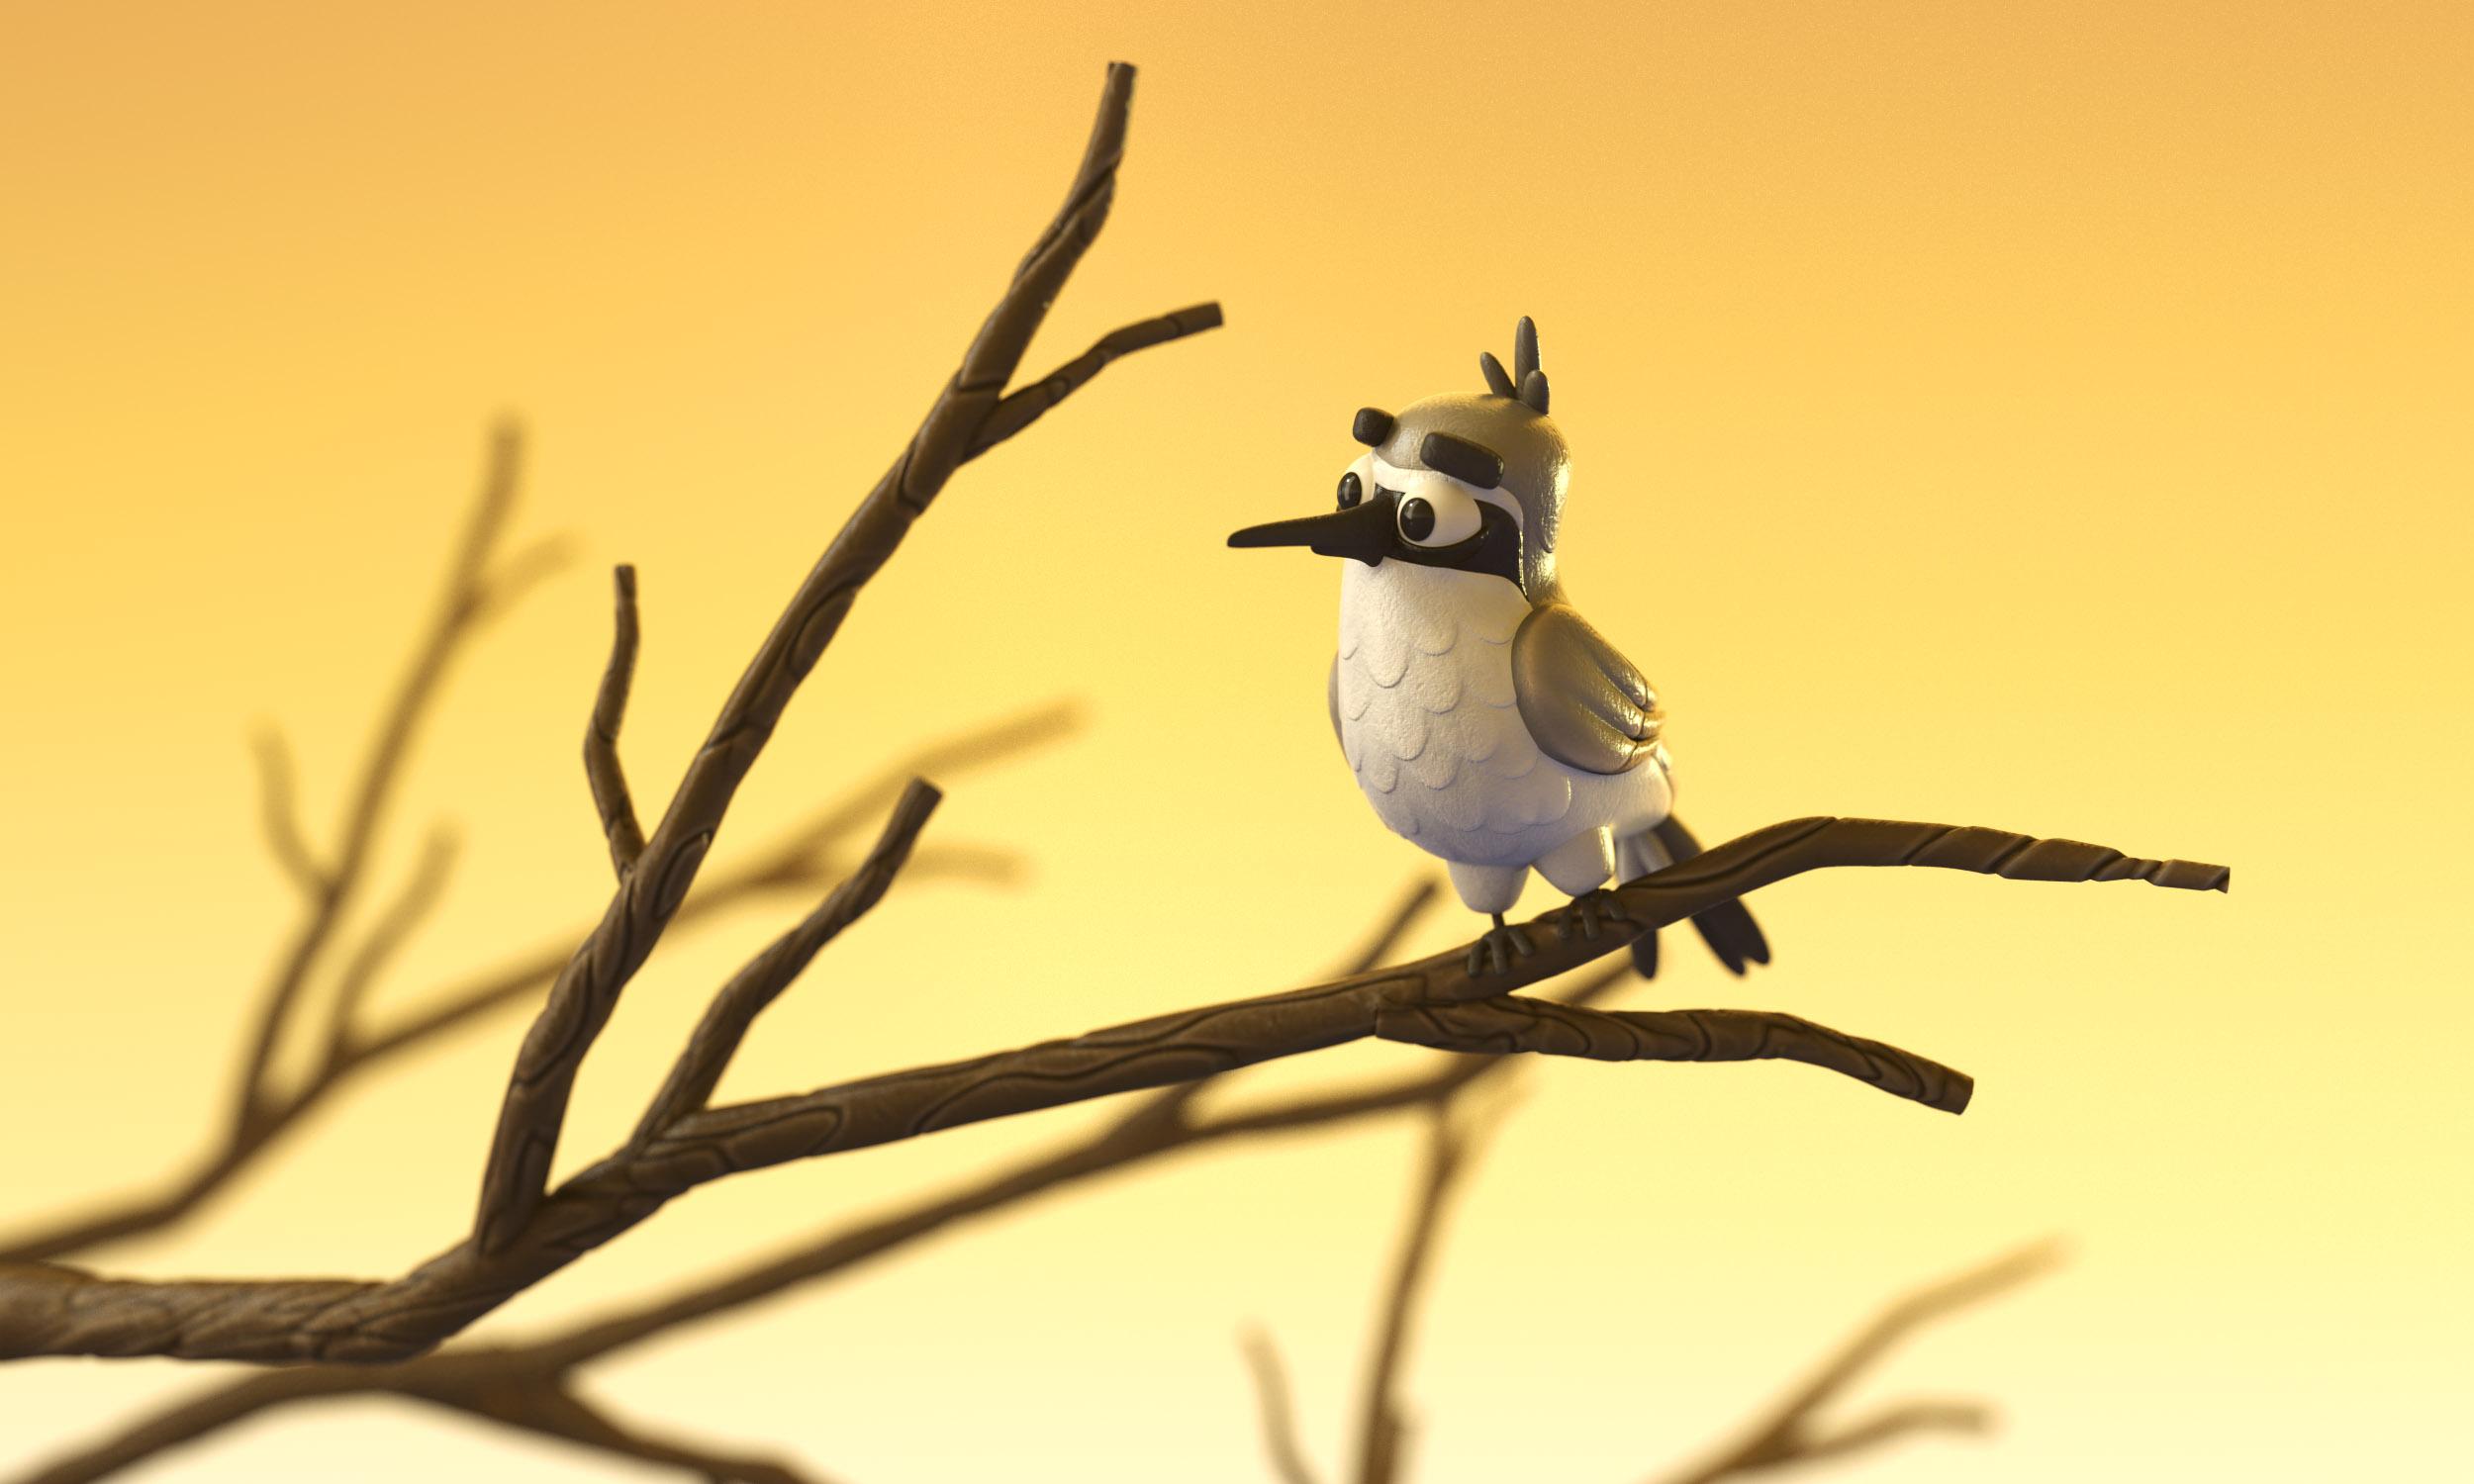 BIO_Bird_Branches_01